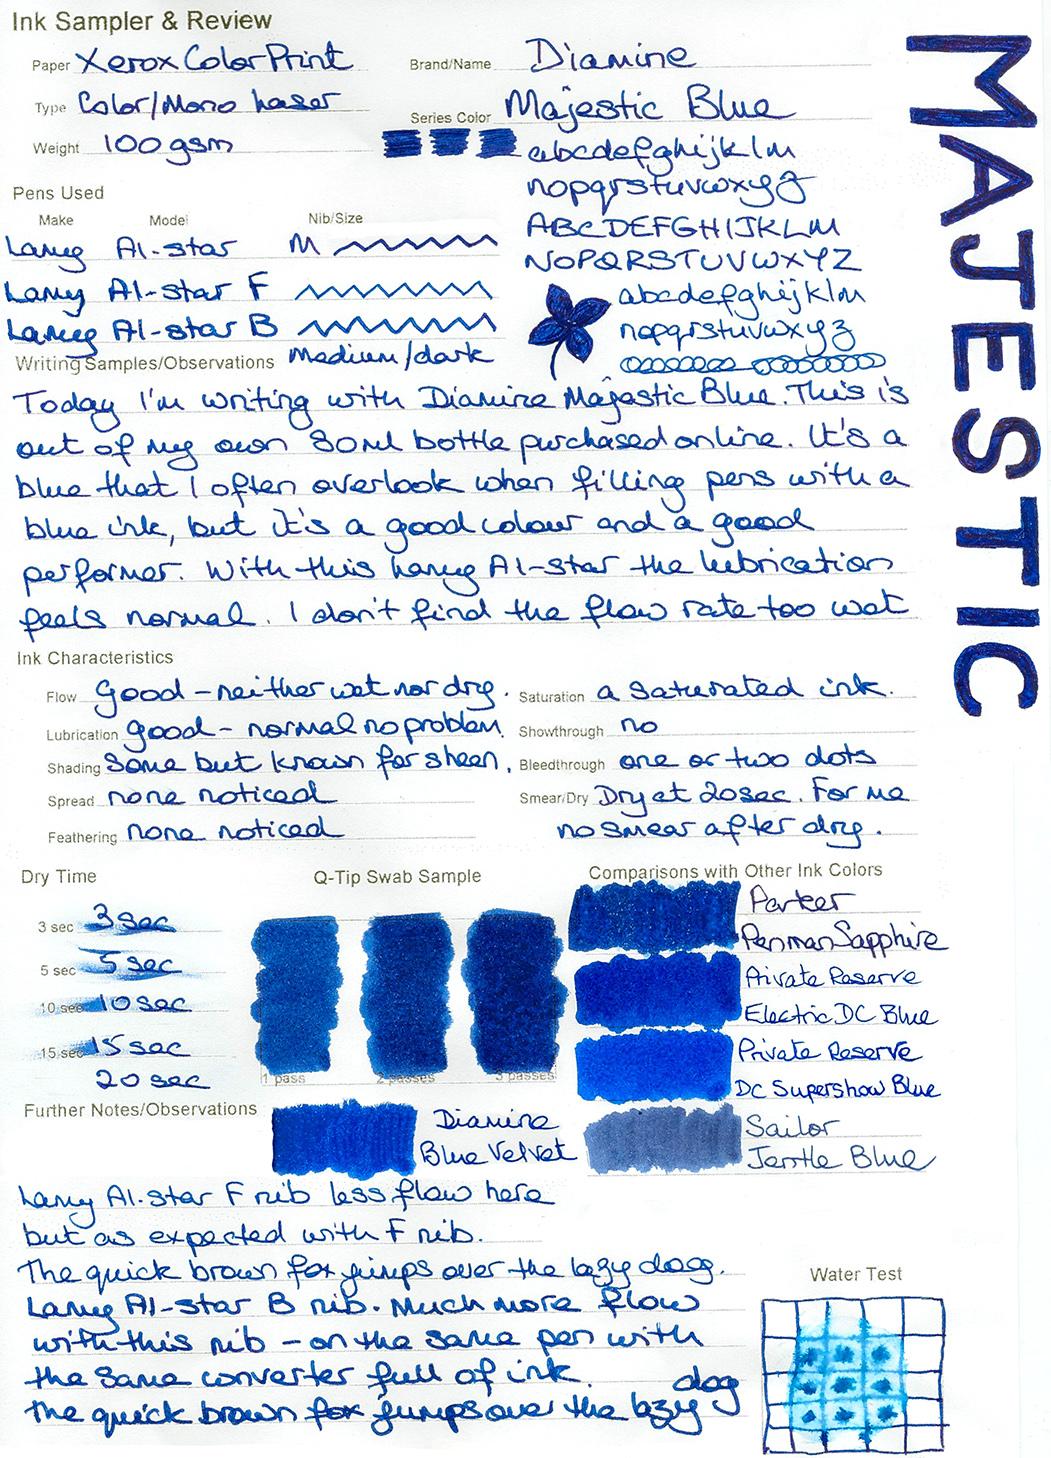 fpn_1516123004__diamine_majestic_blue_5.